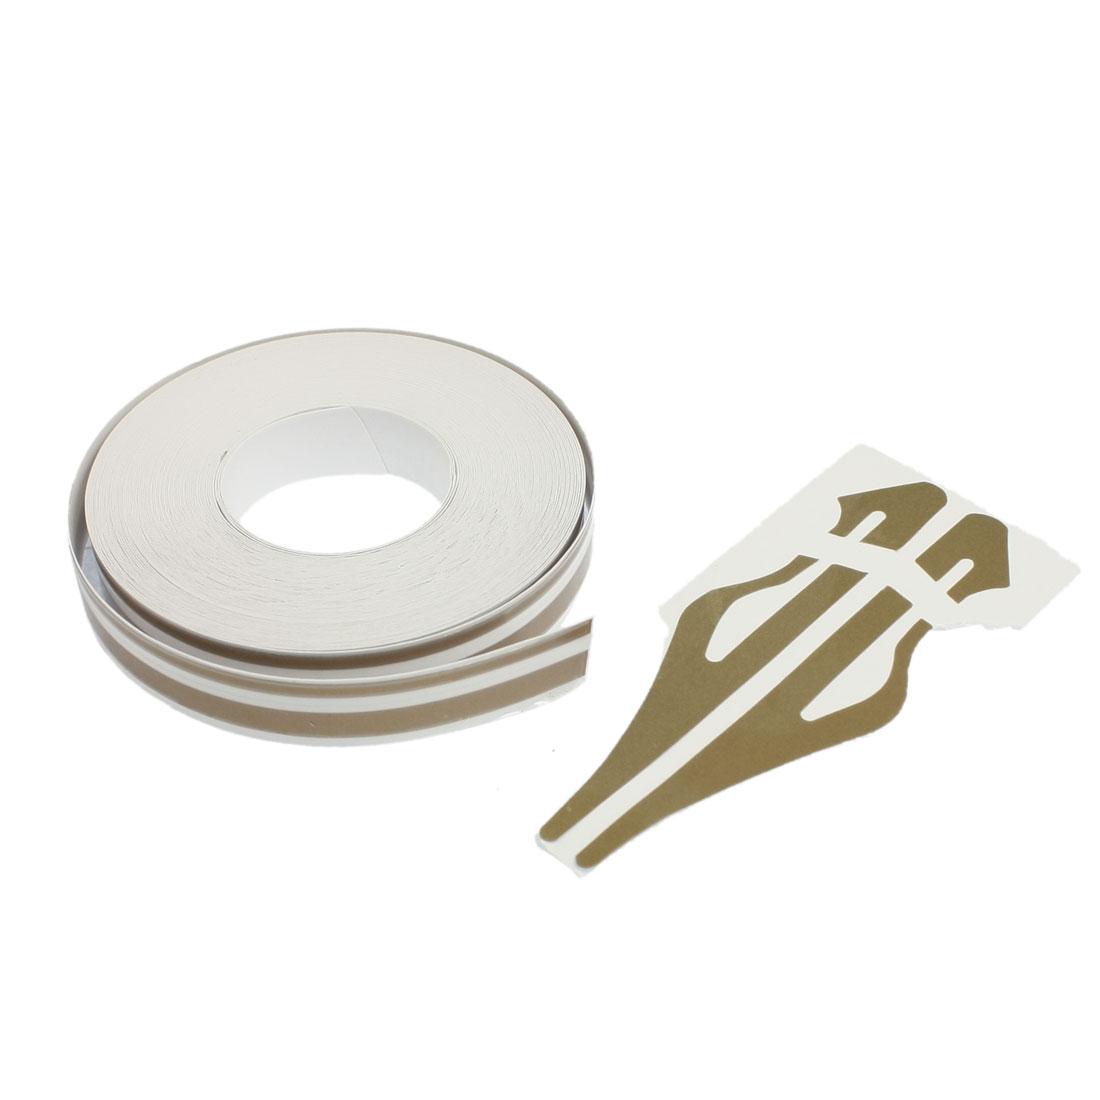 12mm x 9800mm Gold Tone White Car Auto Adhesive Tape Stripe Sticker